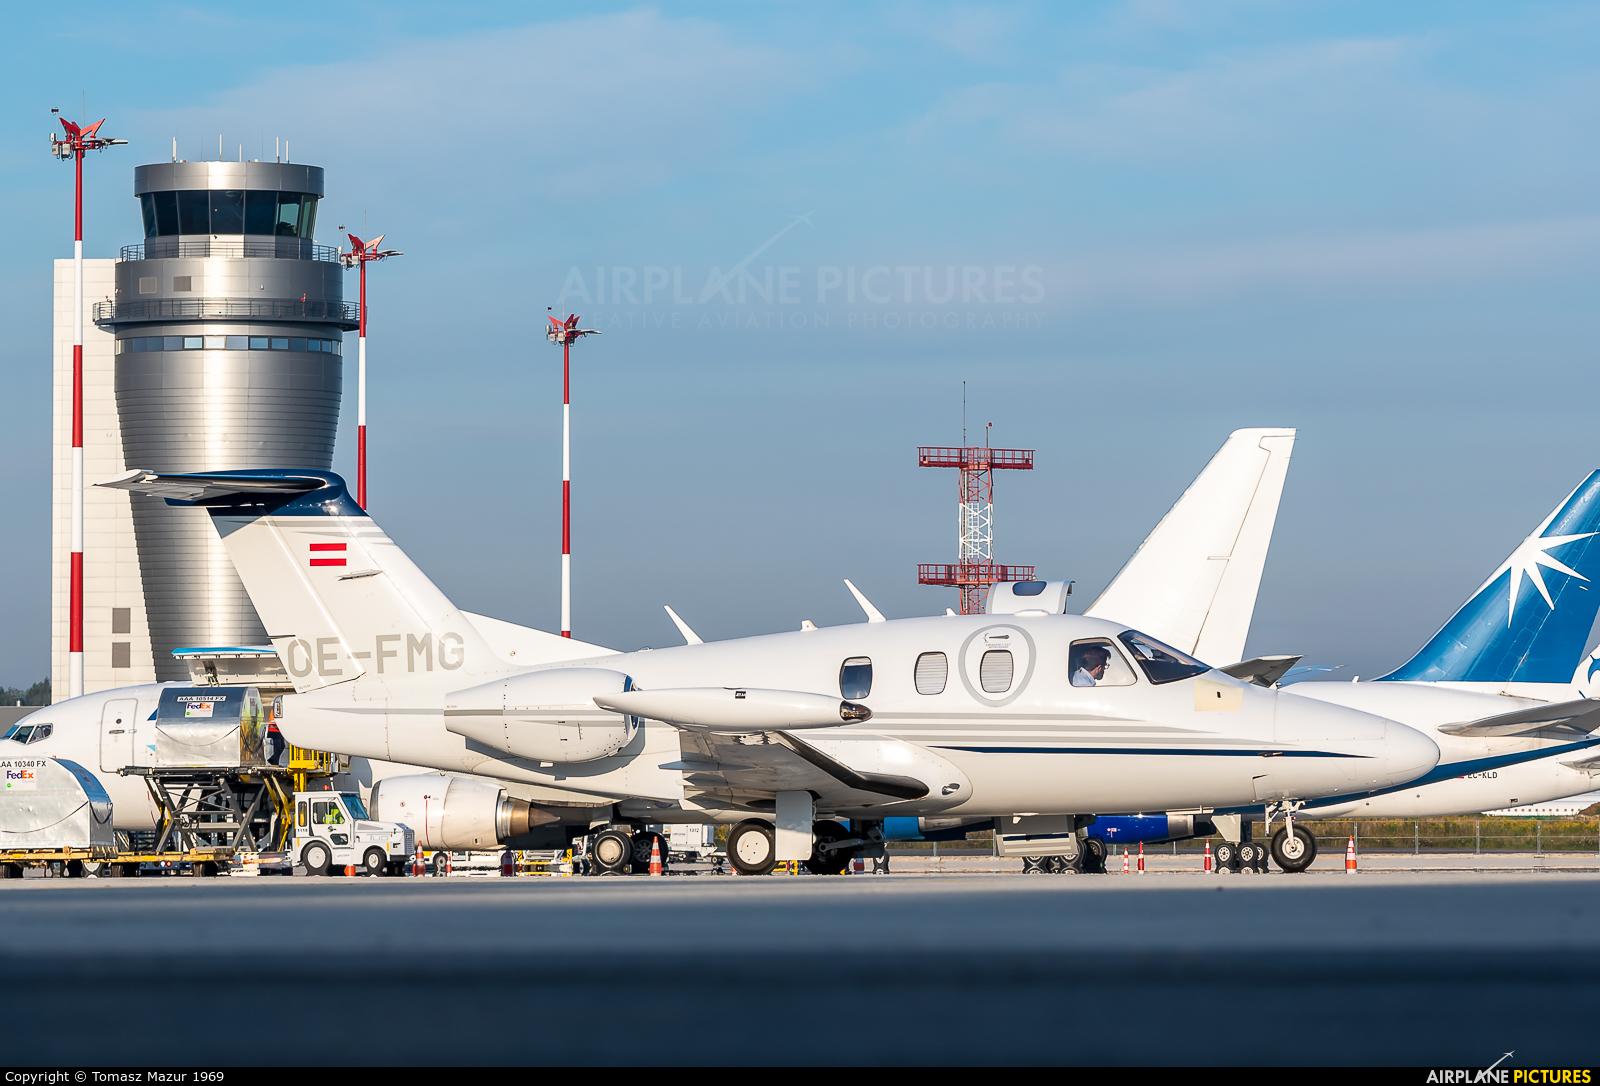 Mali Air Luftverkehr Gesellschaft OE-FMG aircraft at Katowice - Pyrzowice